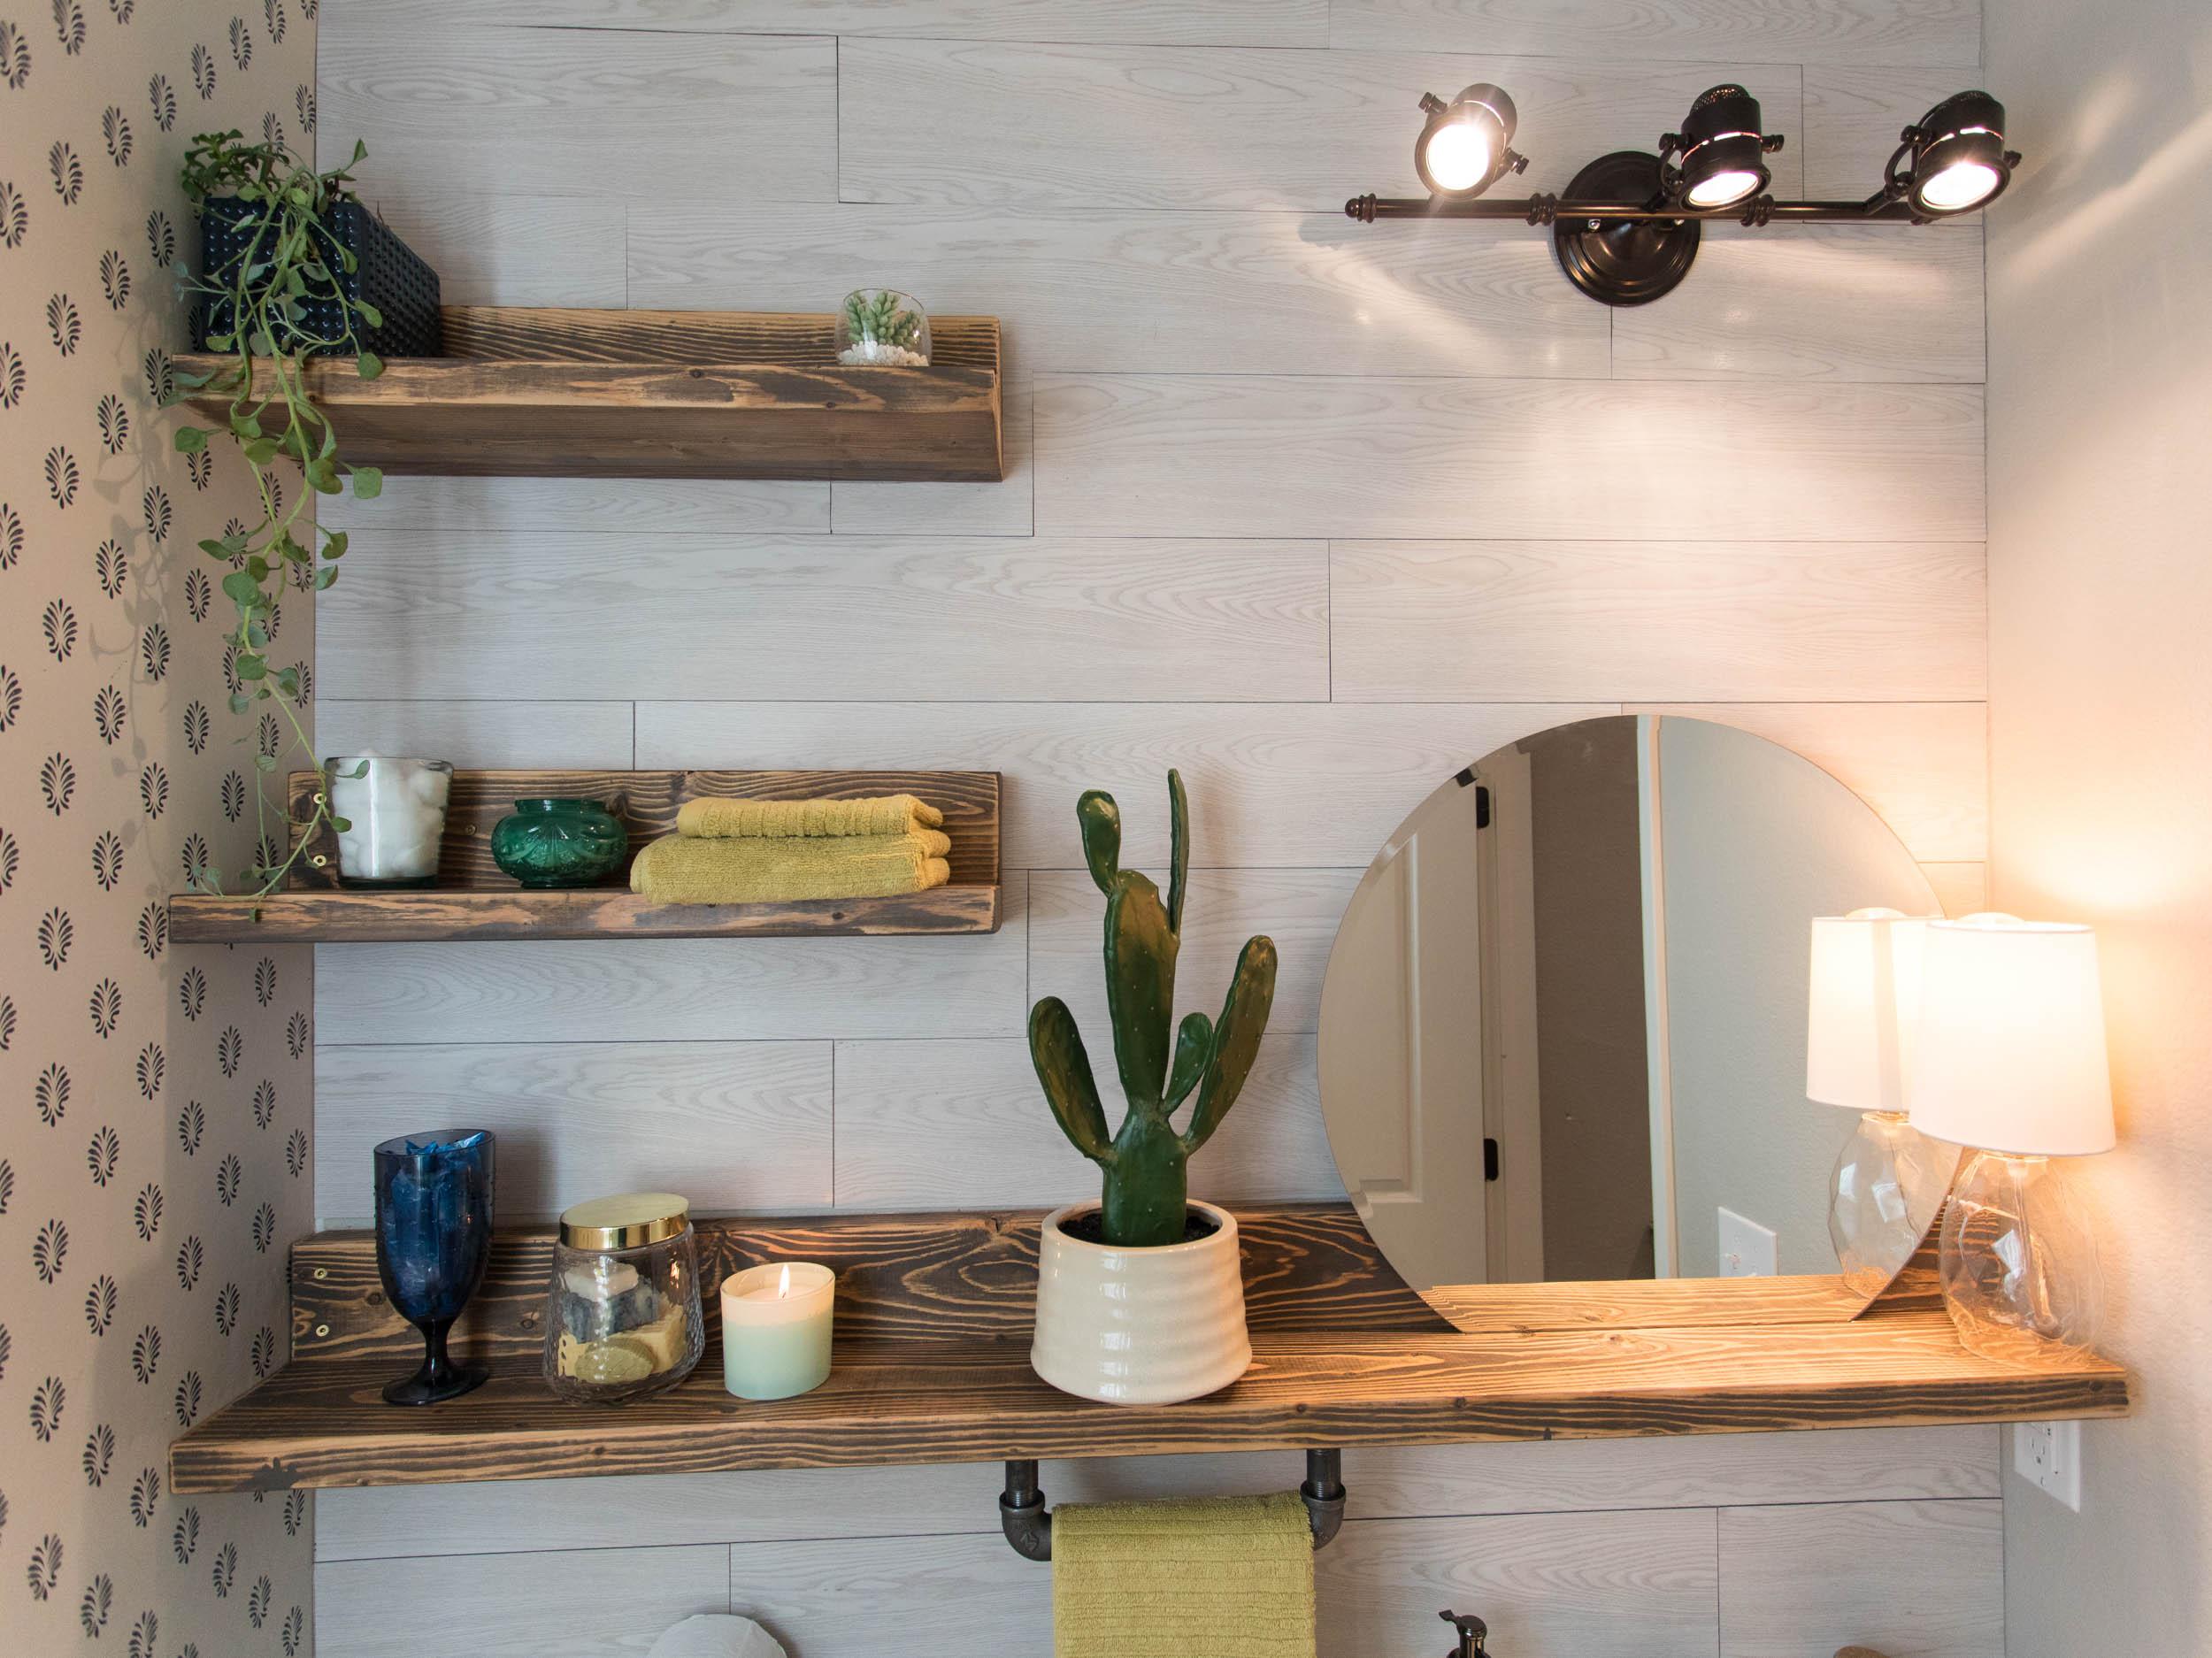 powder bath room renovation | powder bath ideas | small bathroom renovations